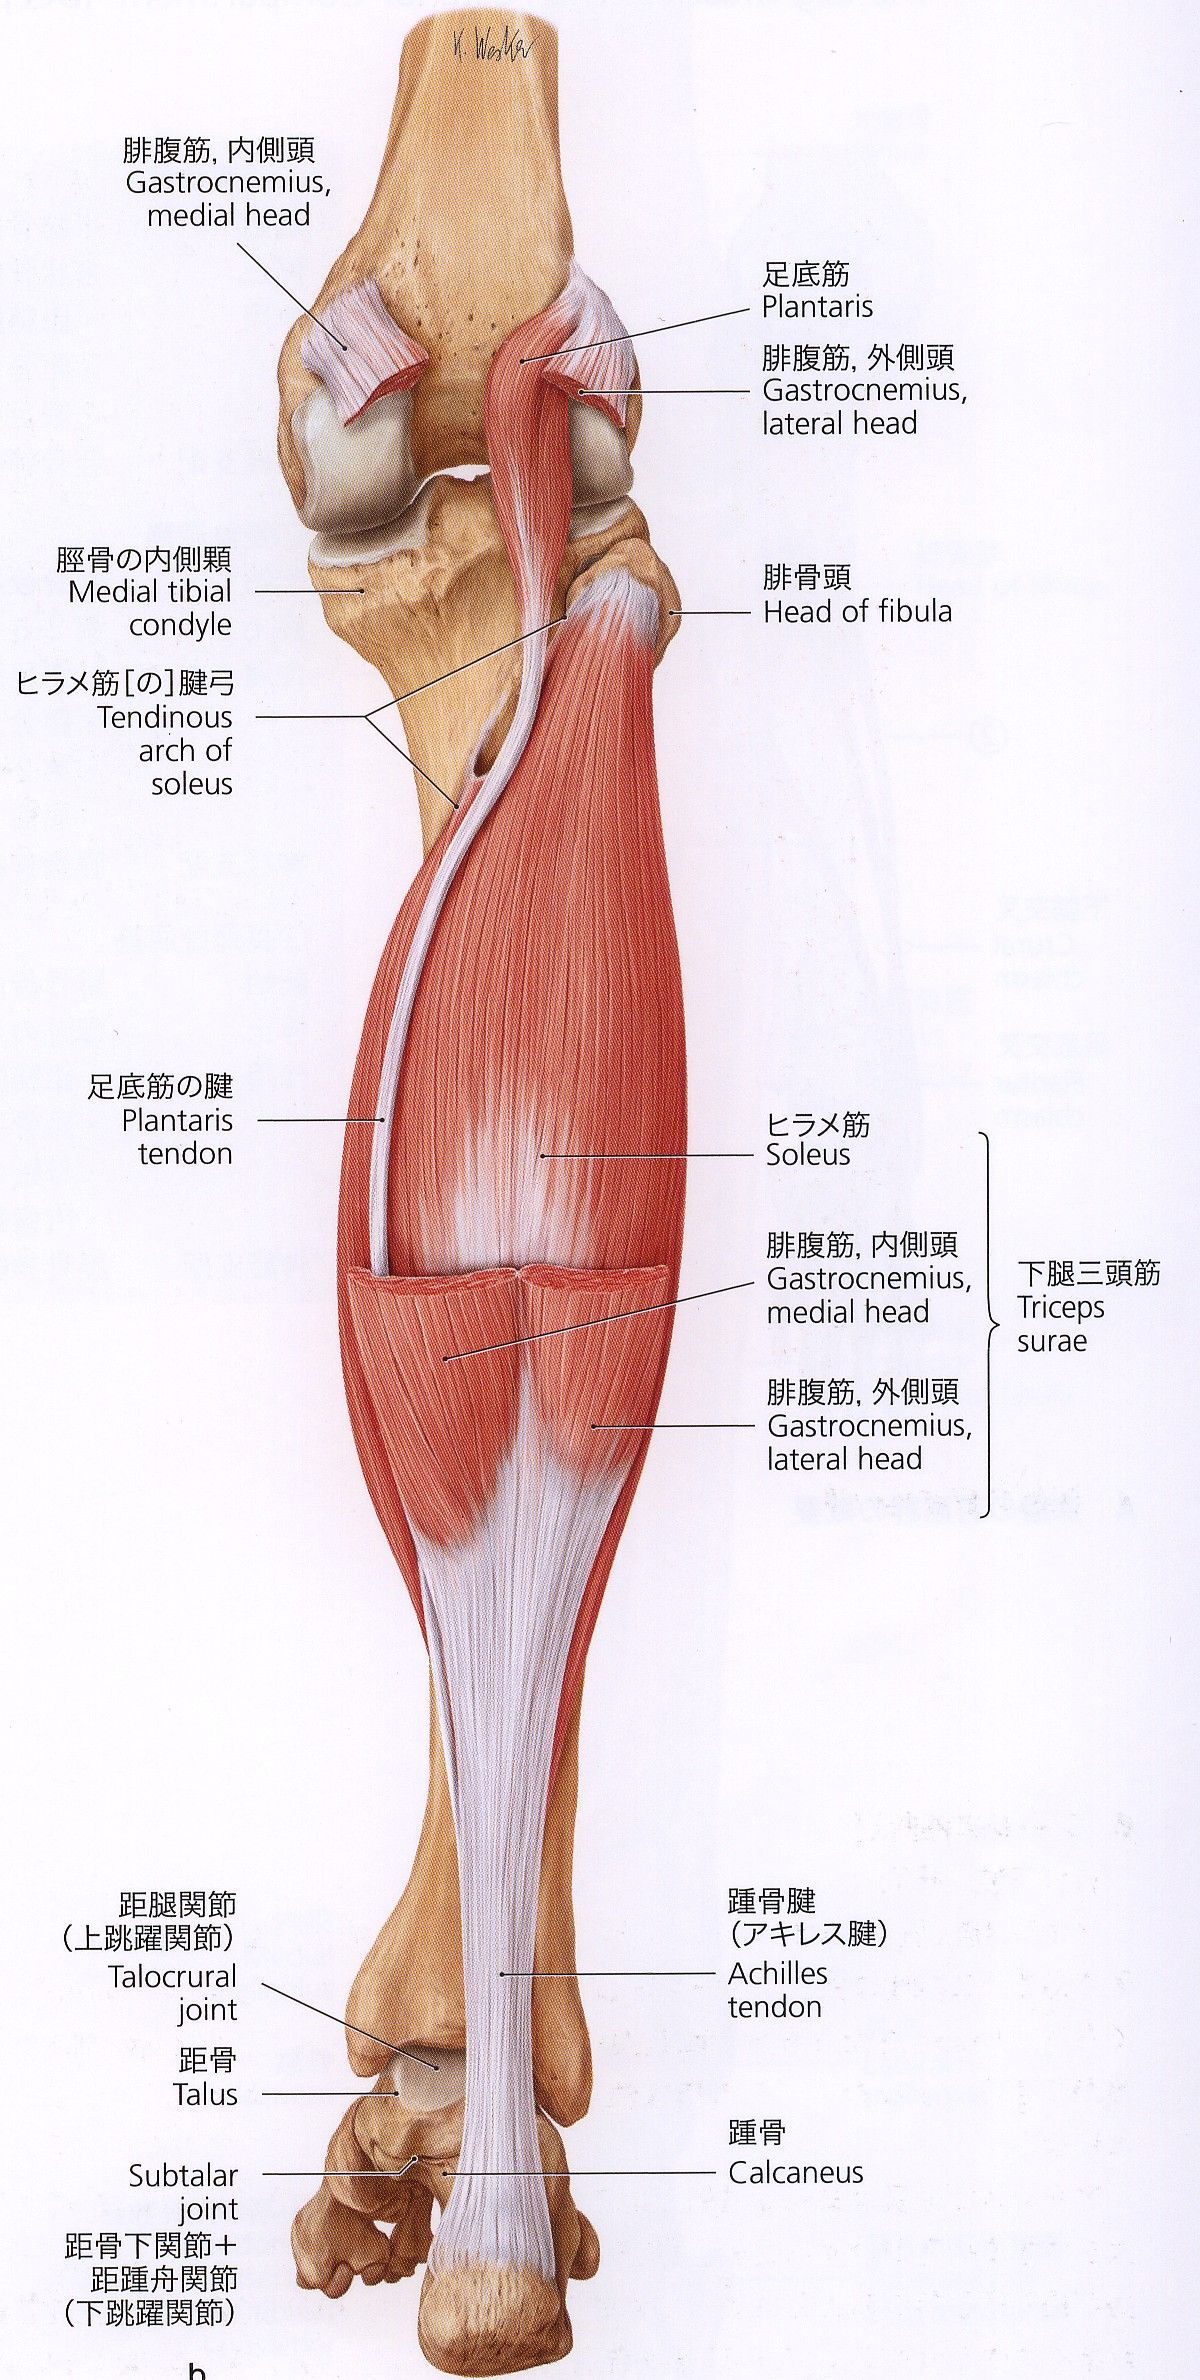 外腹斜筋 - Google 検索 | 医療 | Pinterest | Anatomy, Human anatomy ...